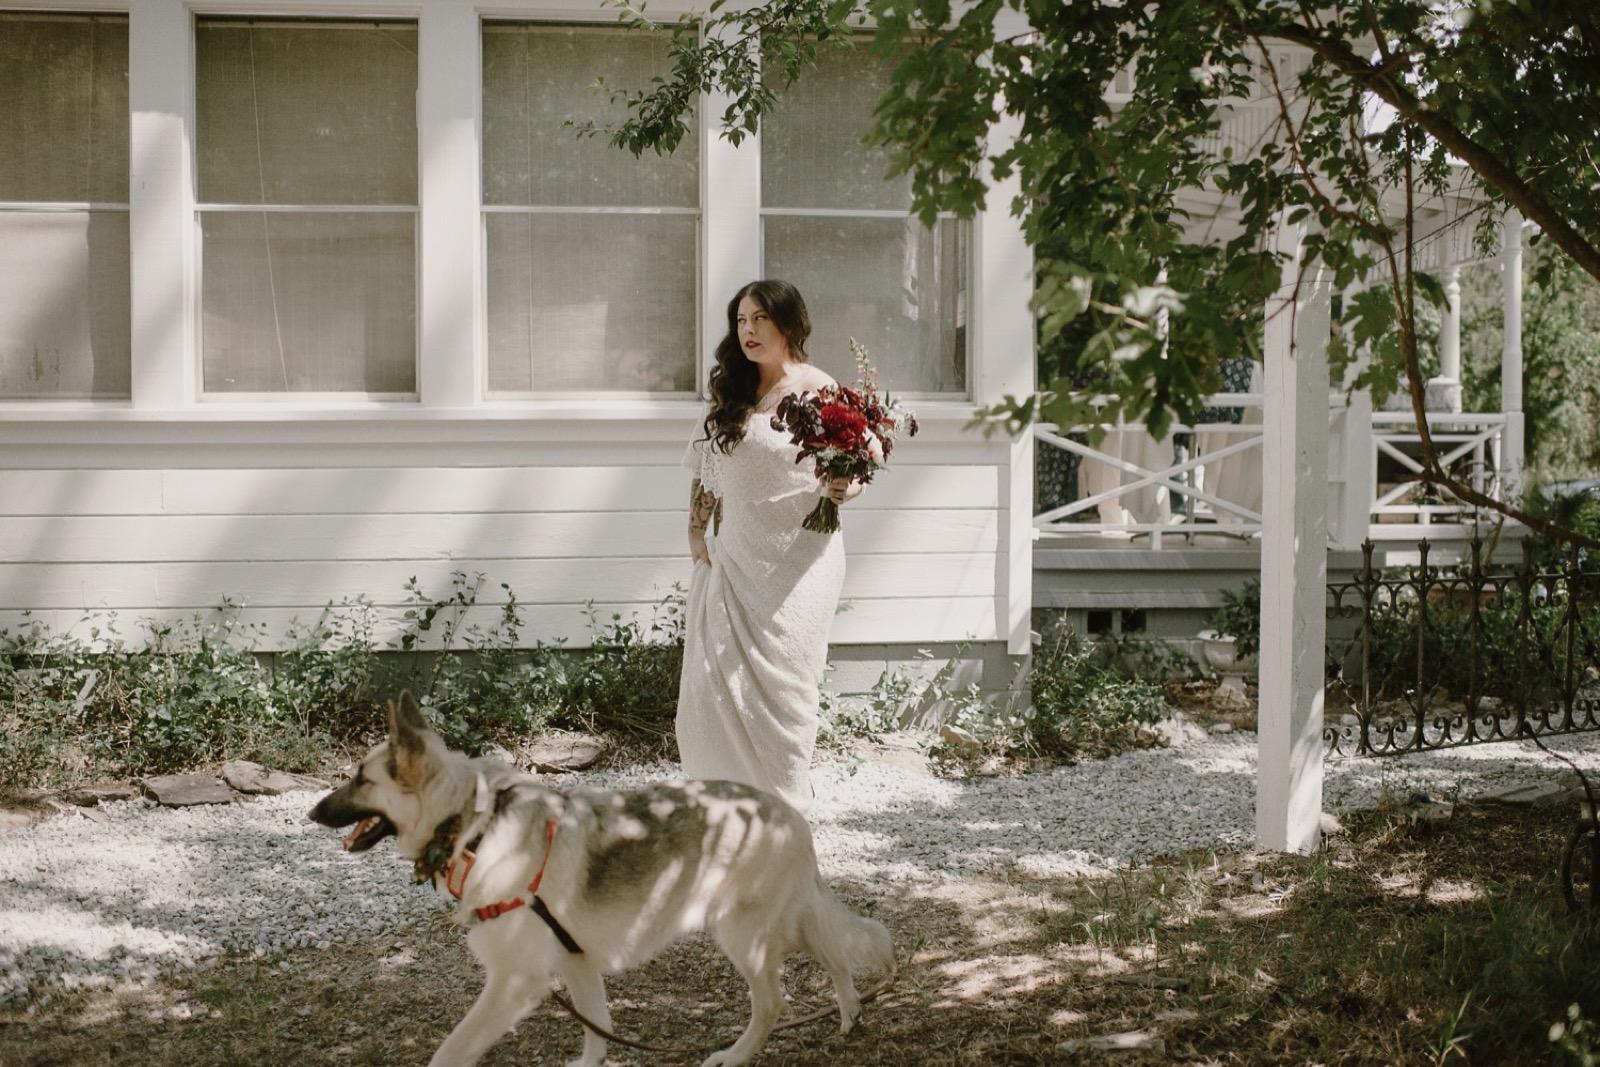 039_California_Ranch_Wedding094.jpg